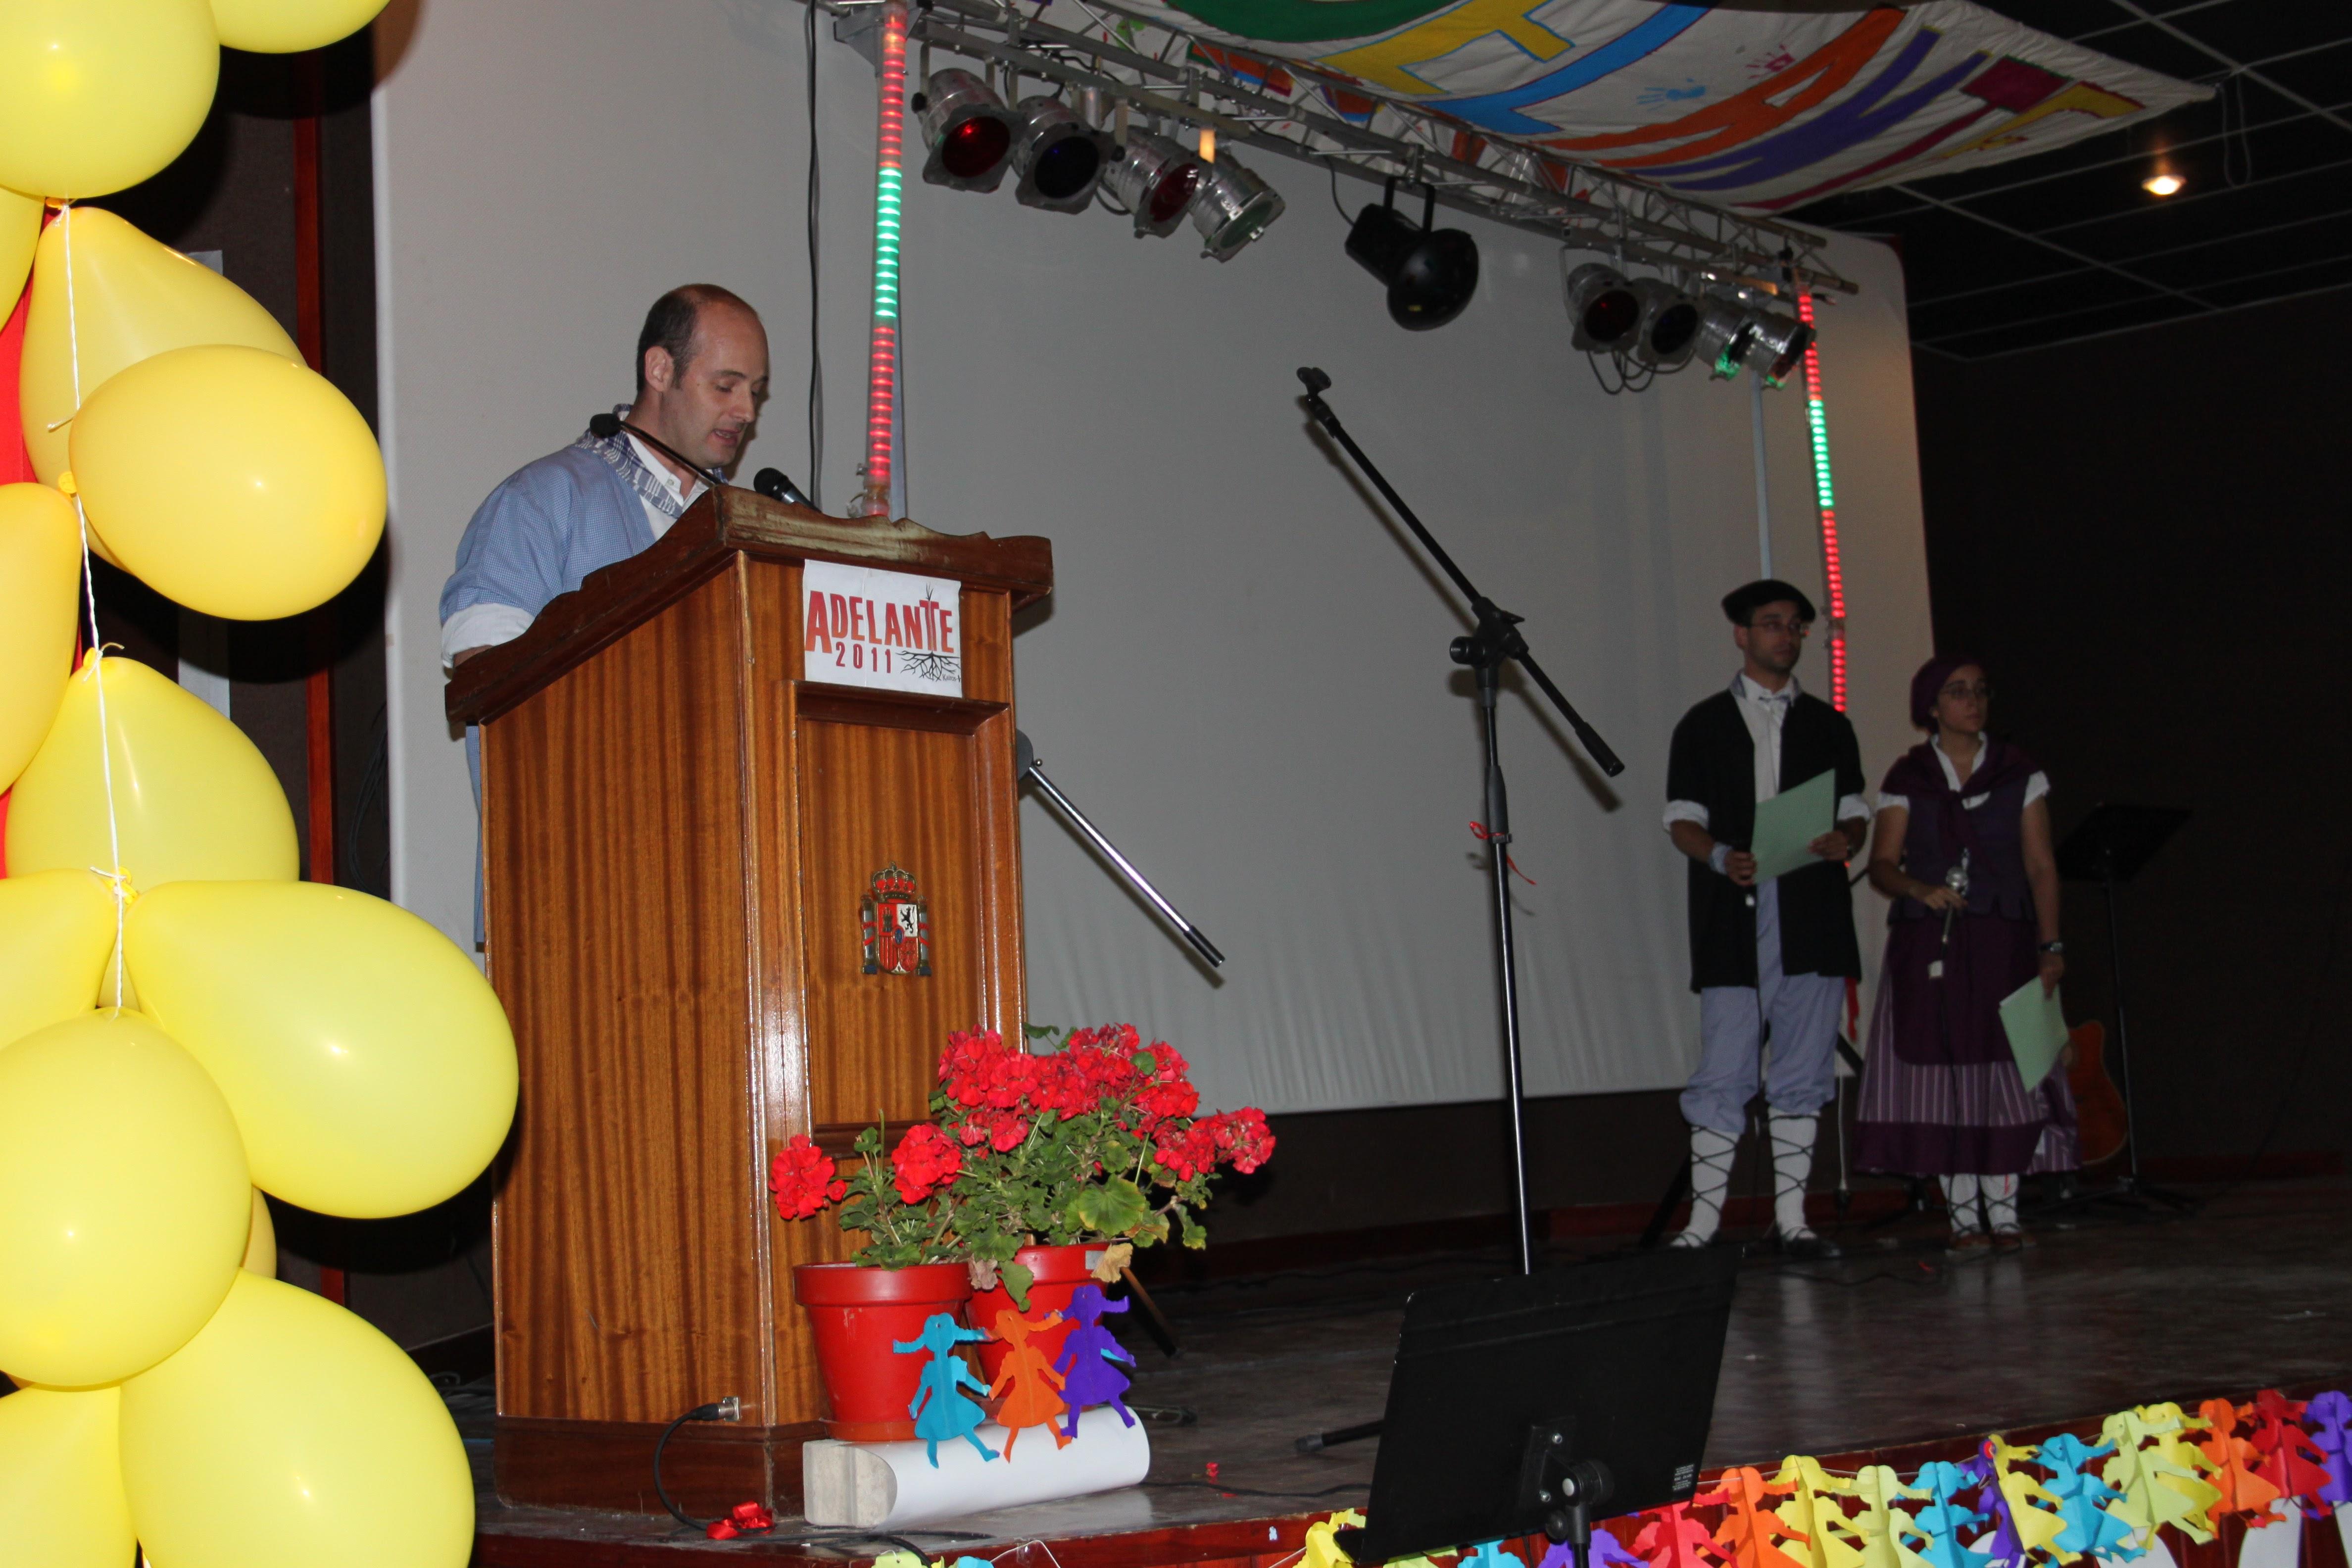 Picasa - Adelante 2011(5).jpg